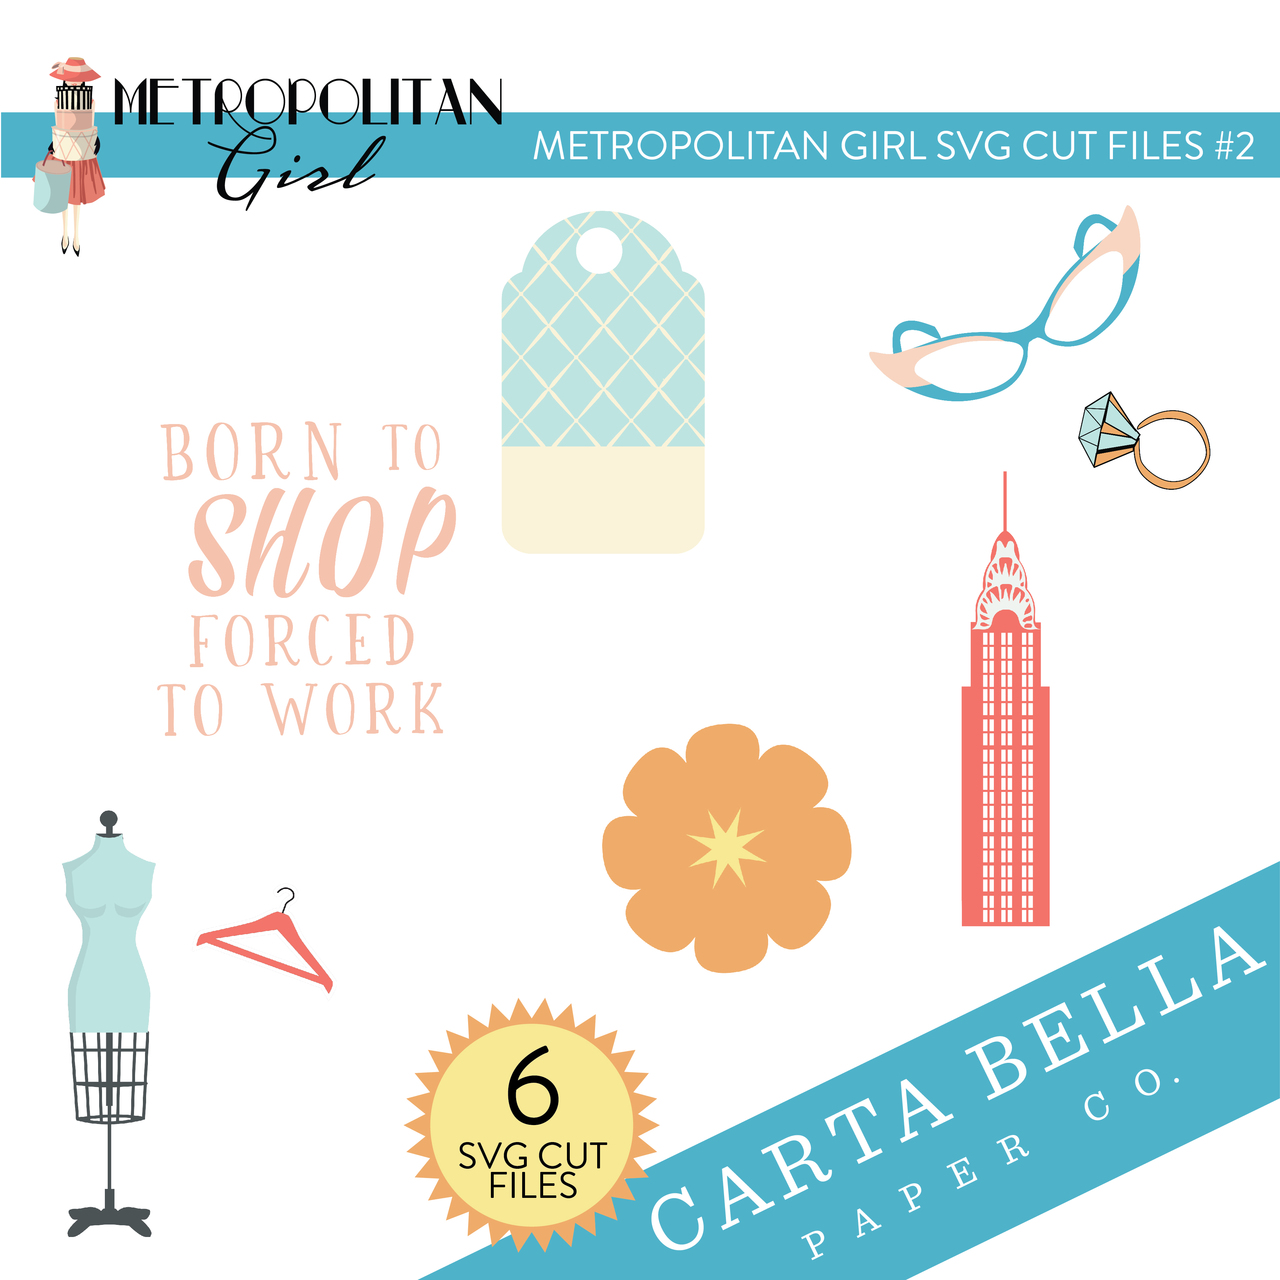 Metropolitan Girl SVG Cut Files #2